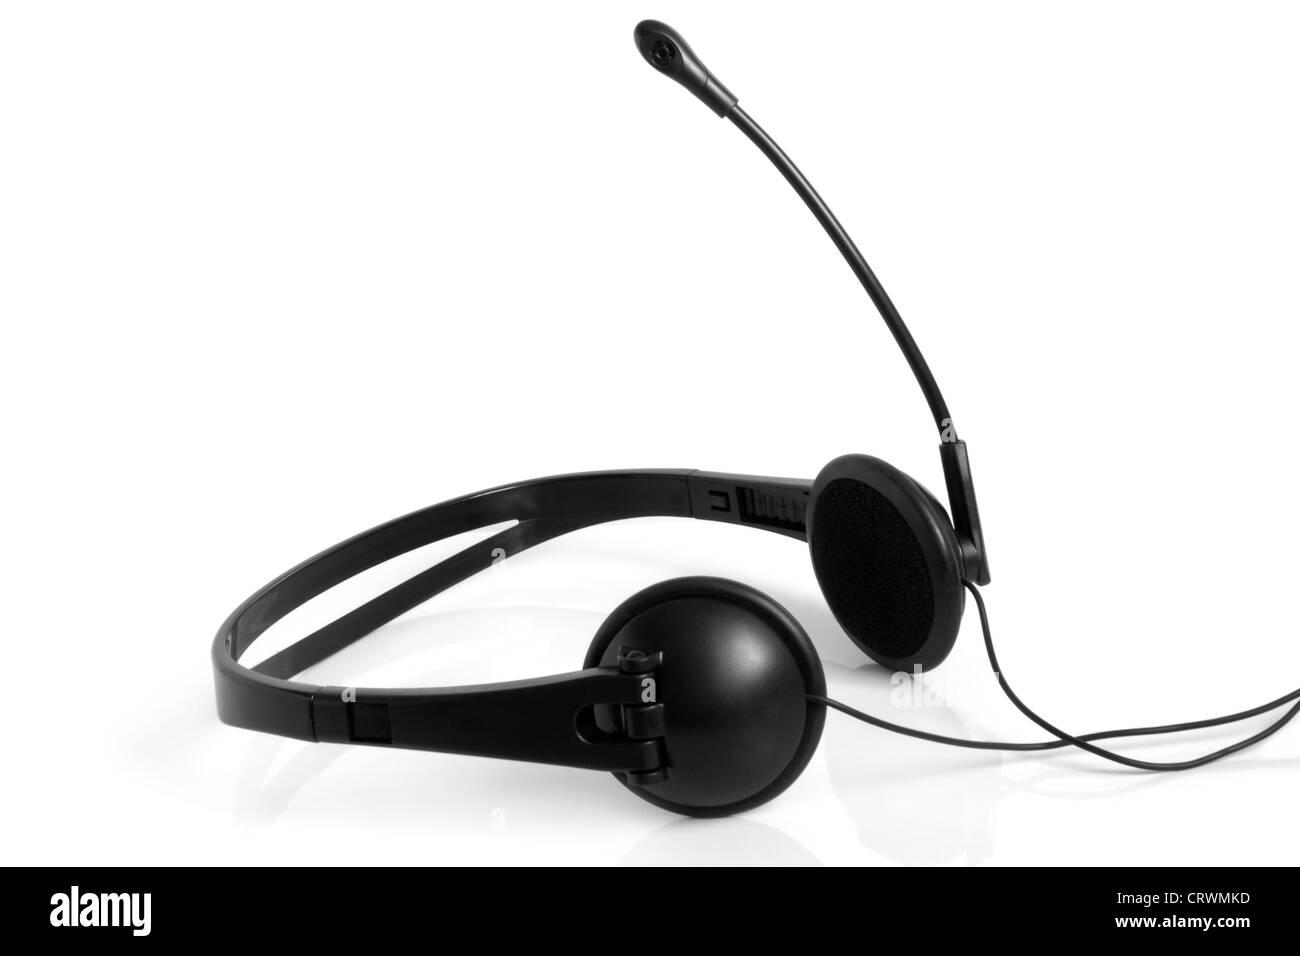 Headset - Stock Image